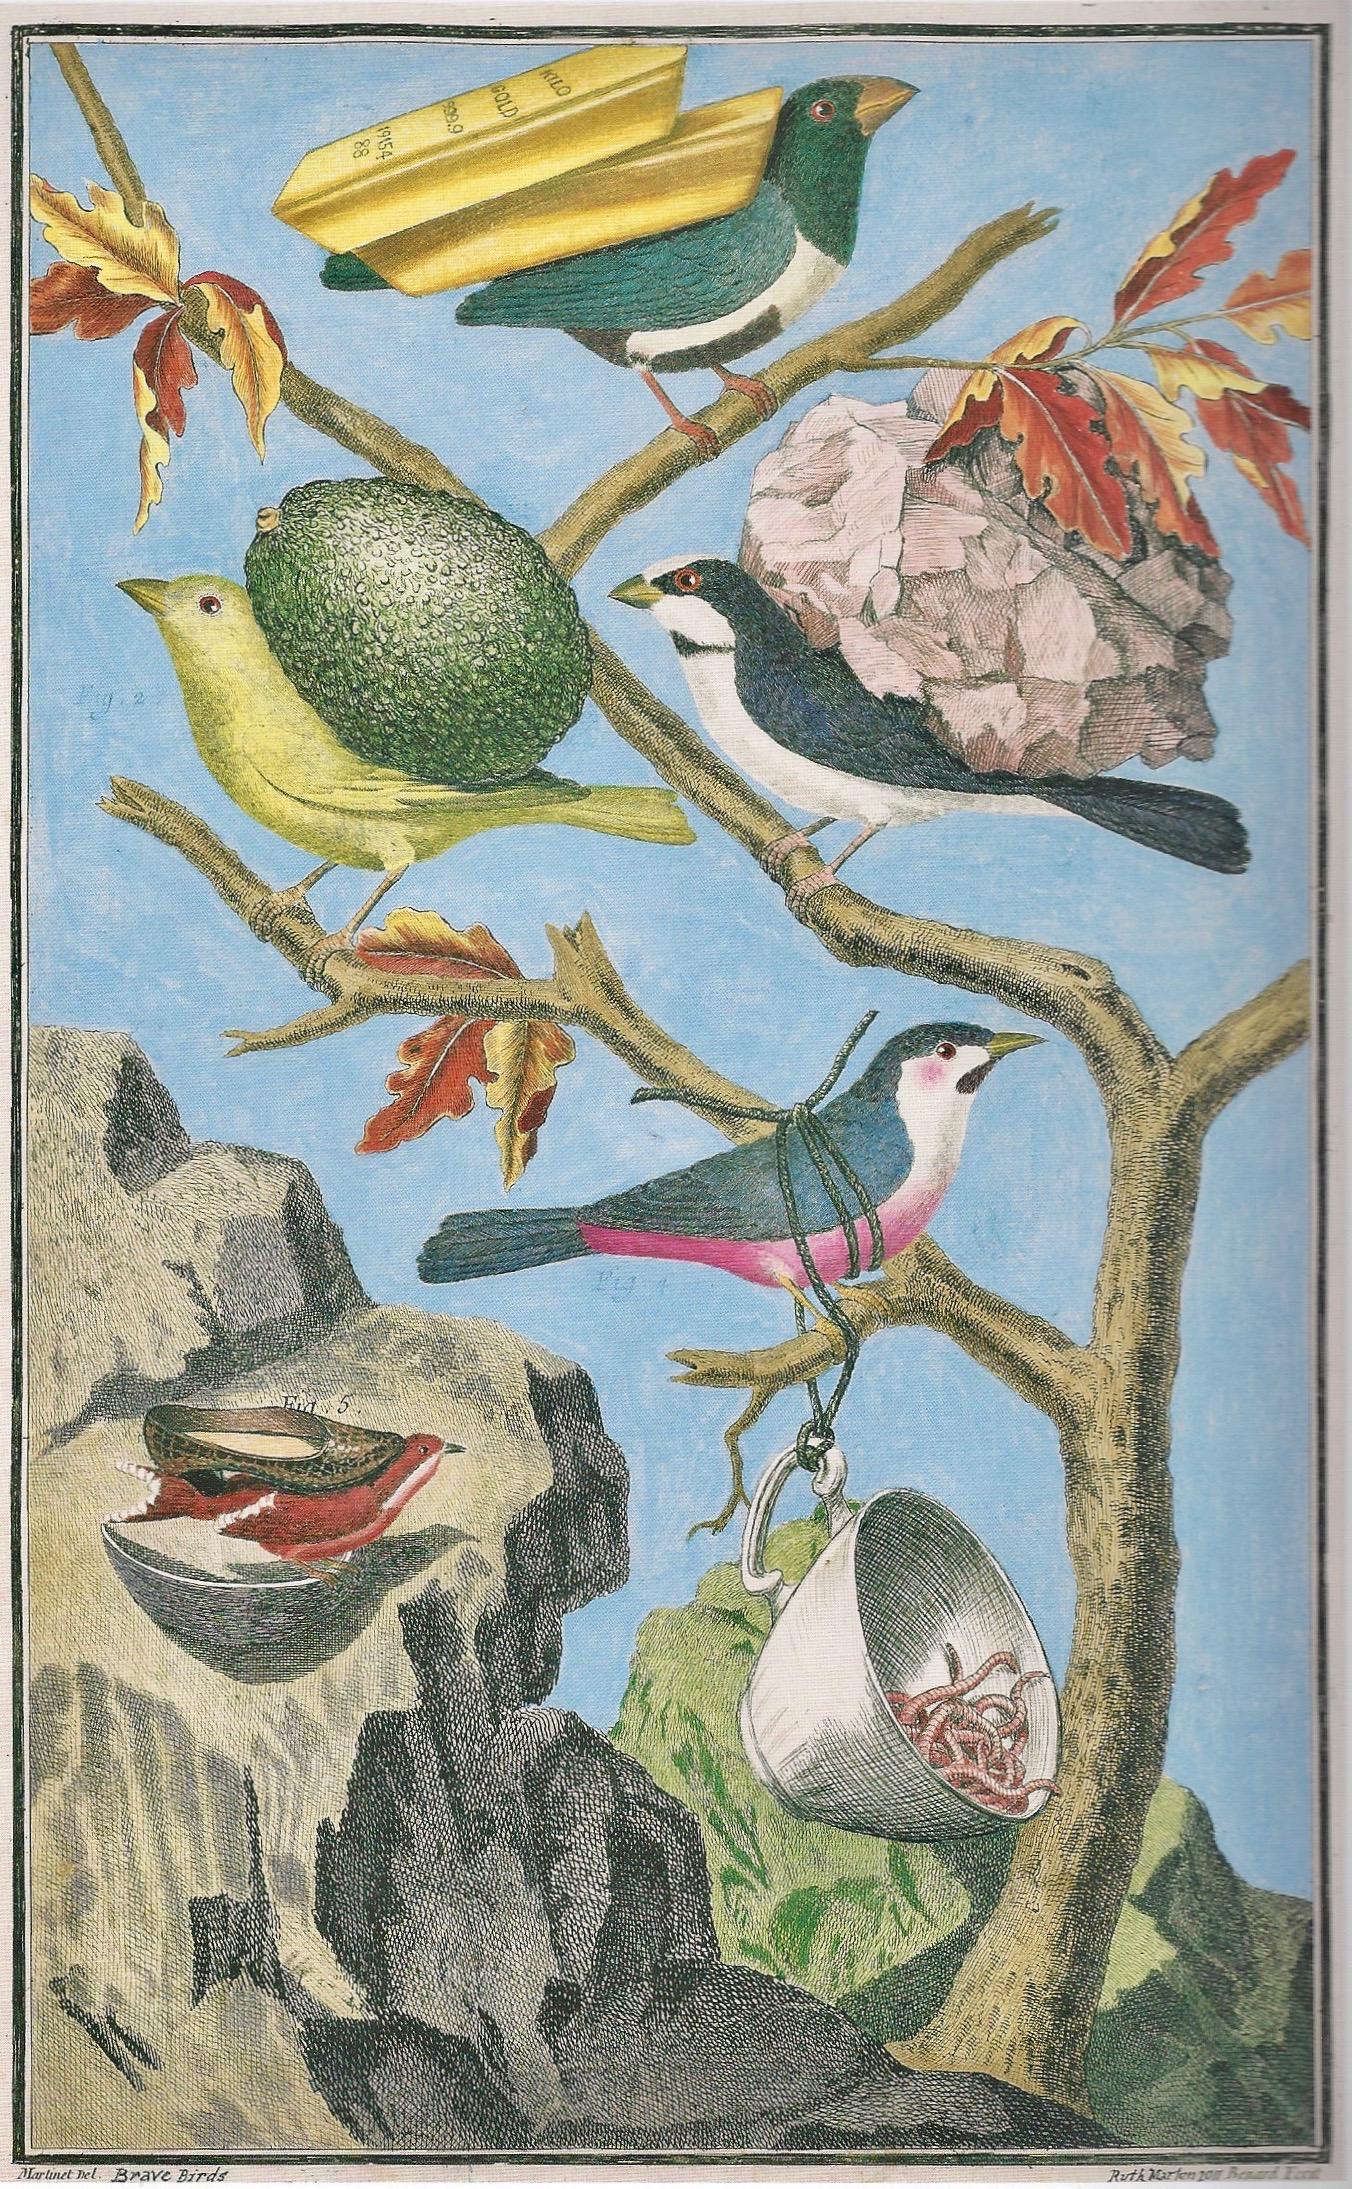 Ruth Marten Brave Birds (2011), Watercolor and Gouache on 18th Century Print, 33,6 x 20,7 cm